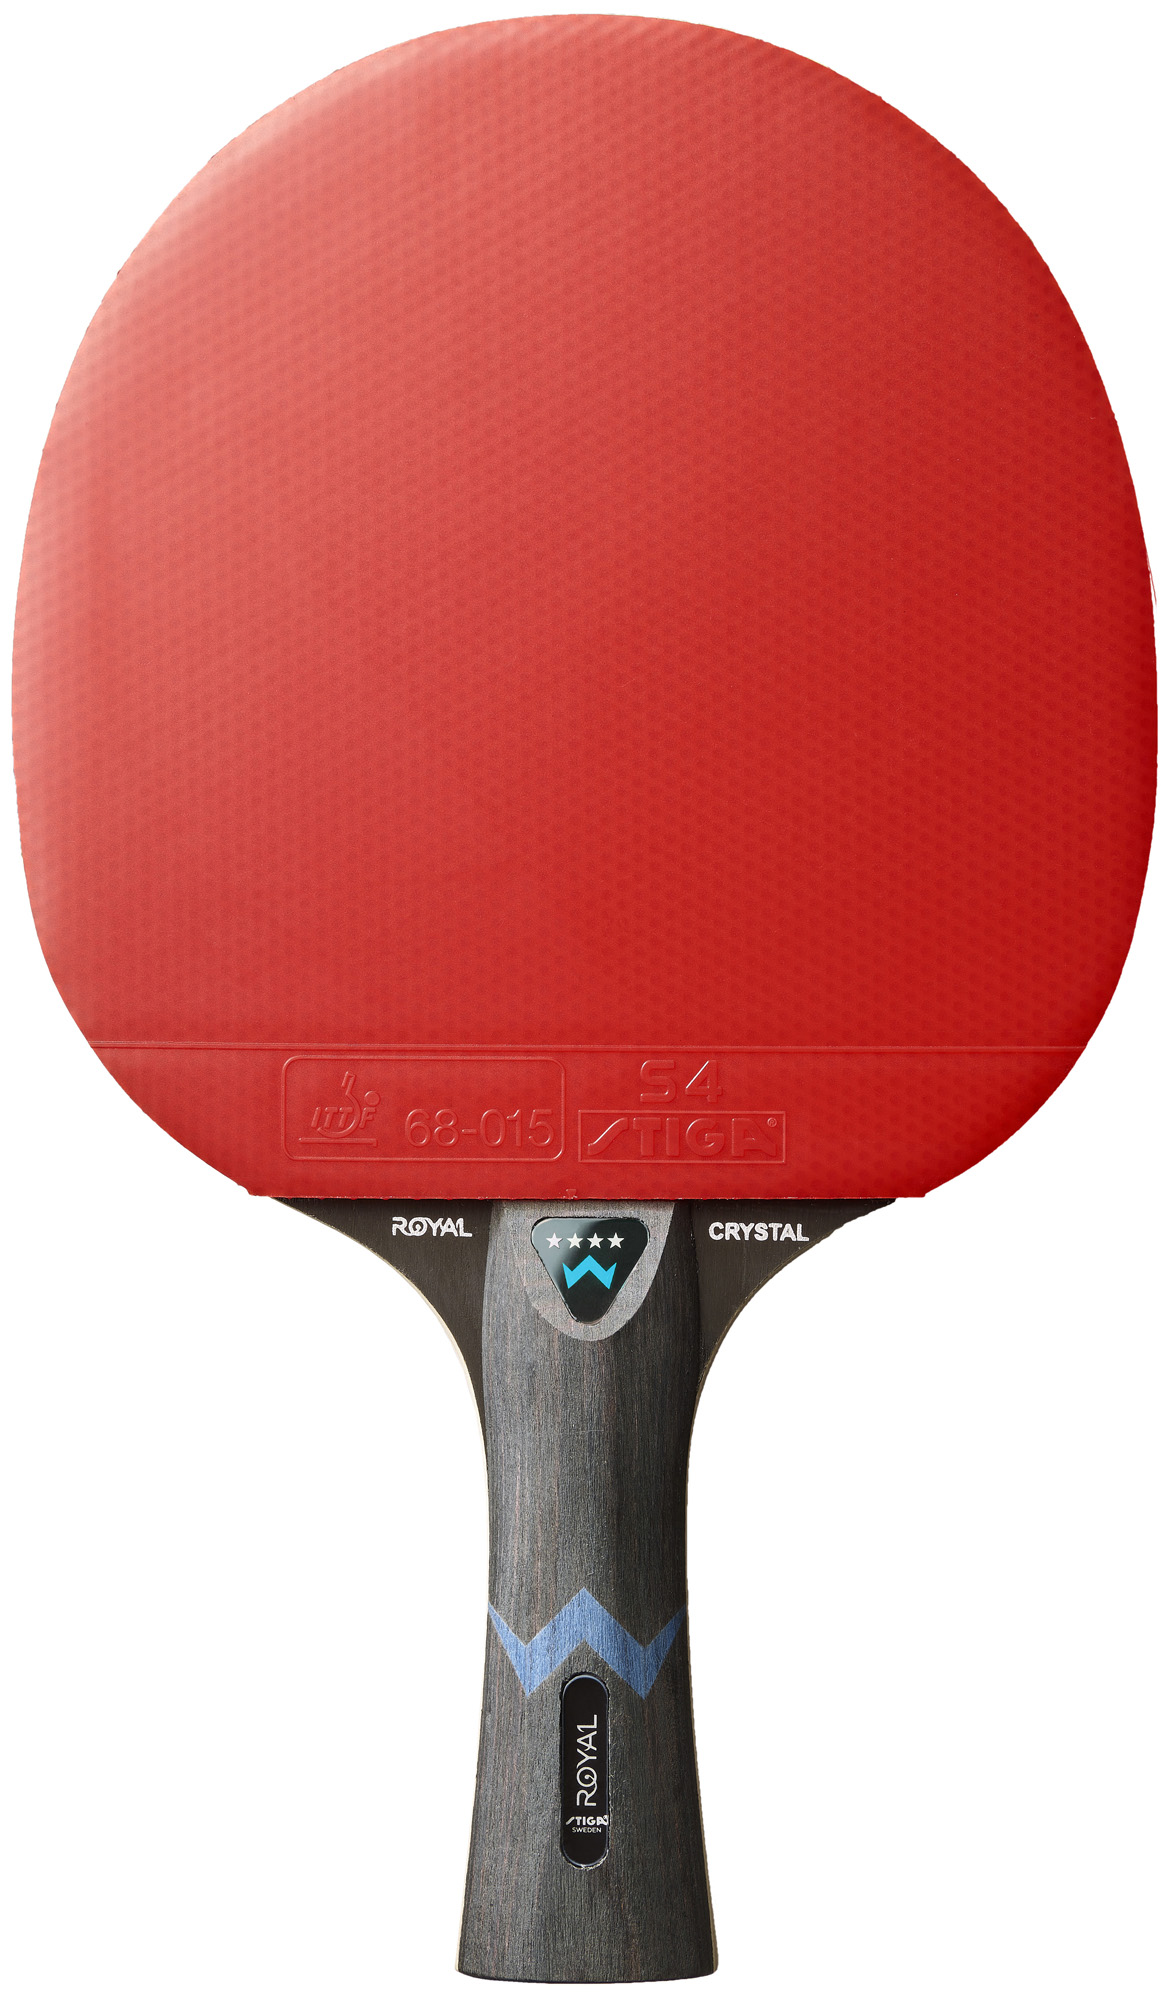 Stiga Ракетка для настольного тенниса Stiga ROYAL 4-star CRYSTAL все цены